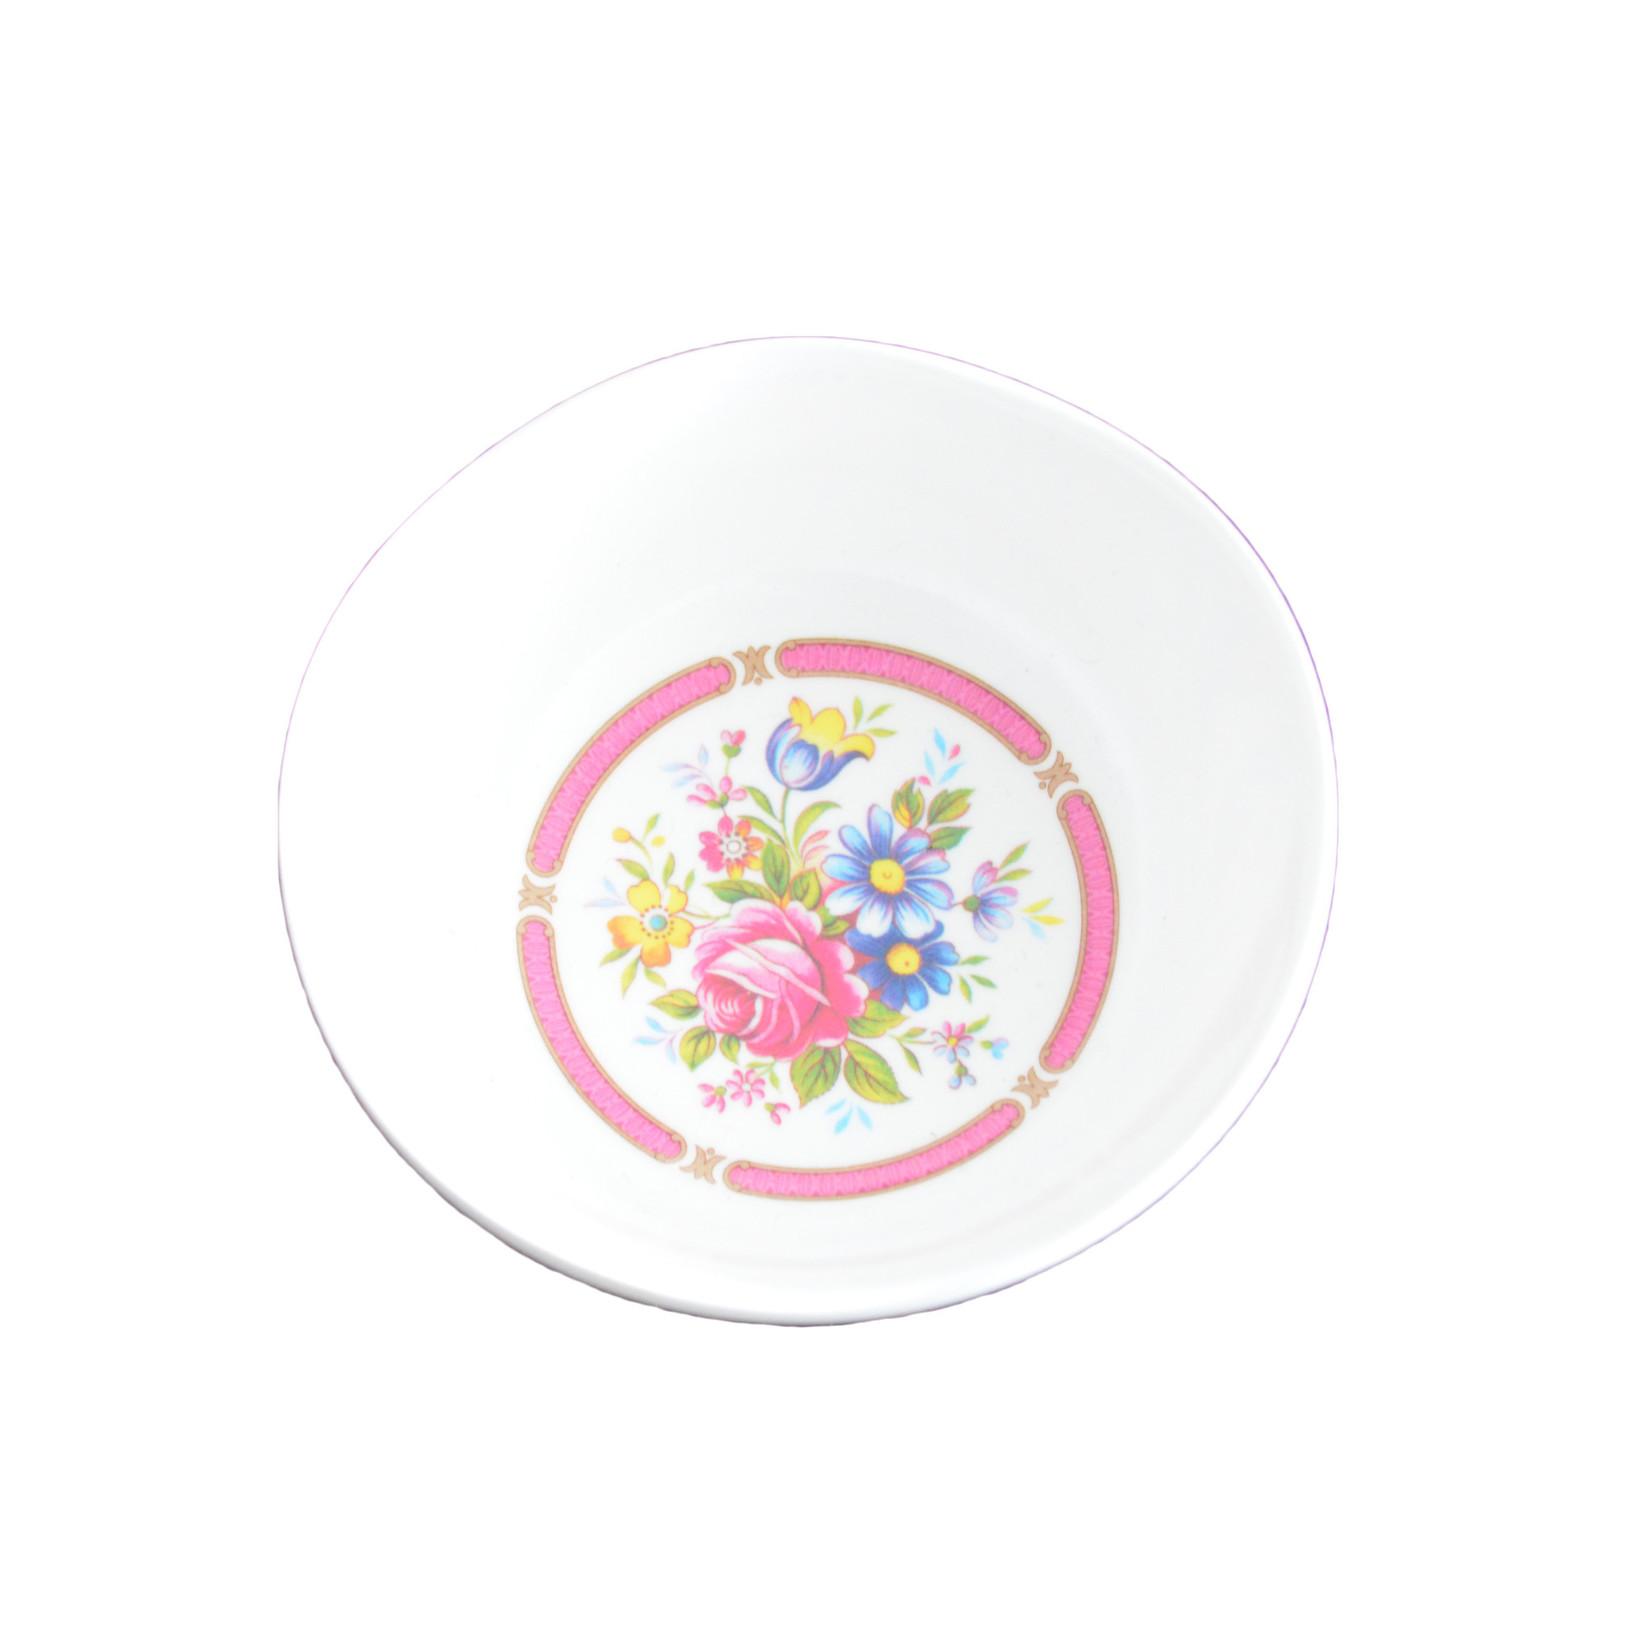 Floral Glass Sauce Dish